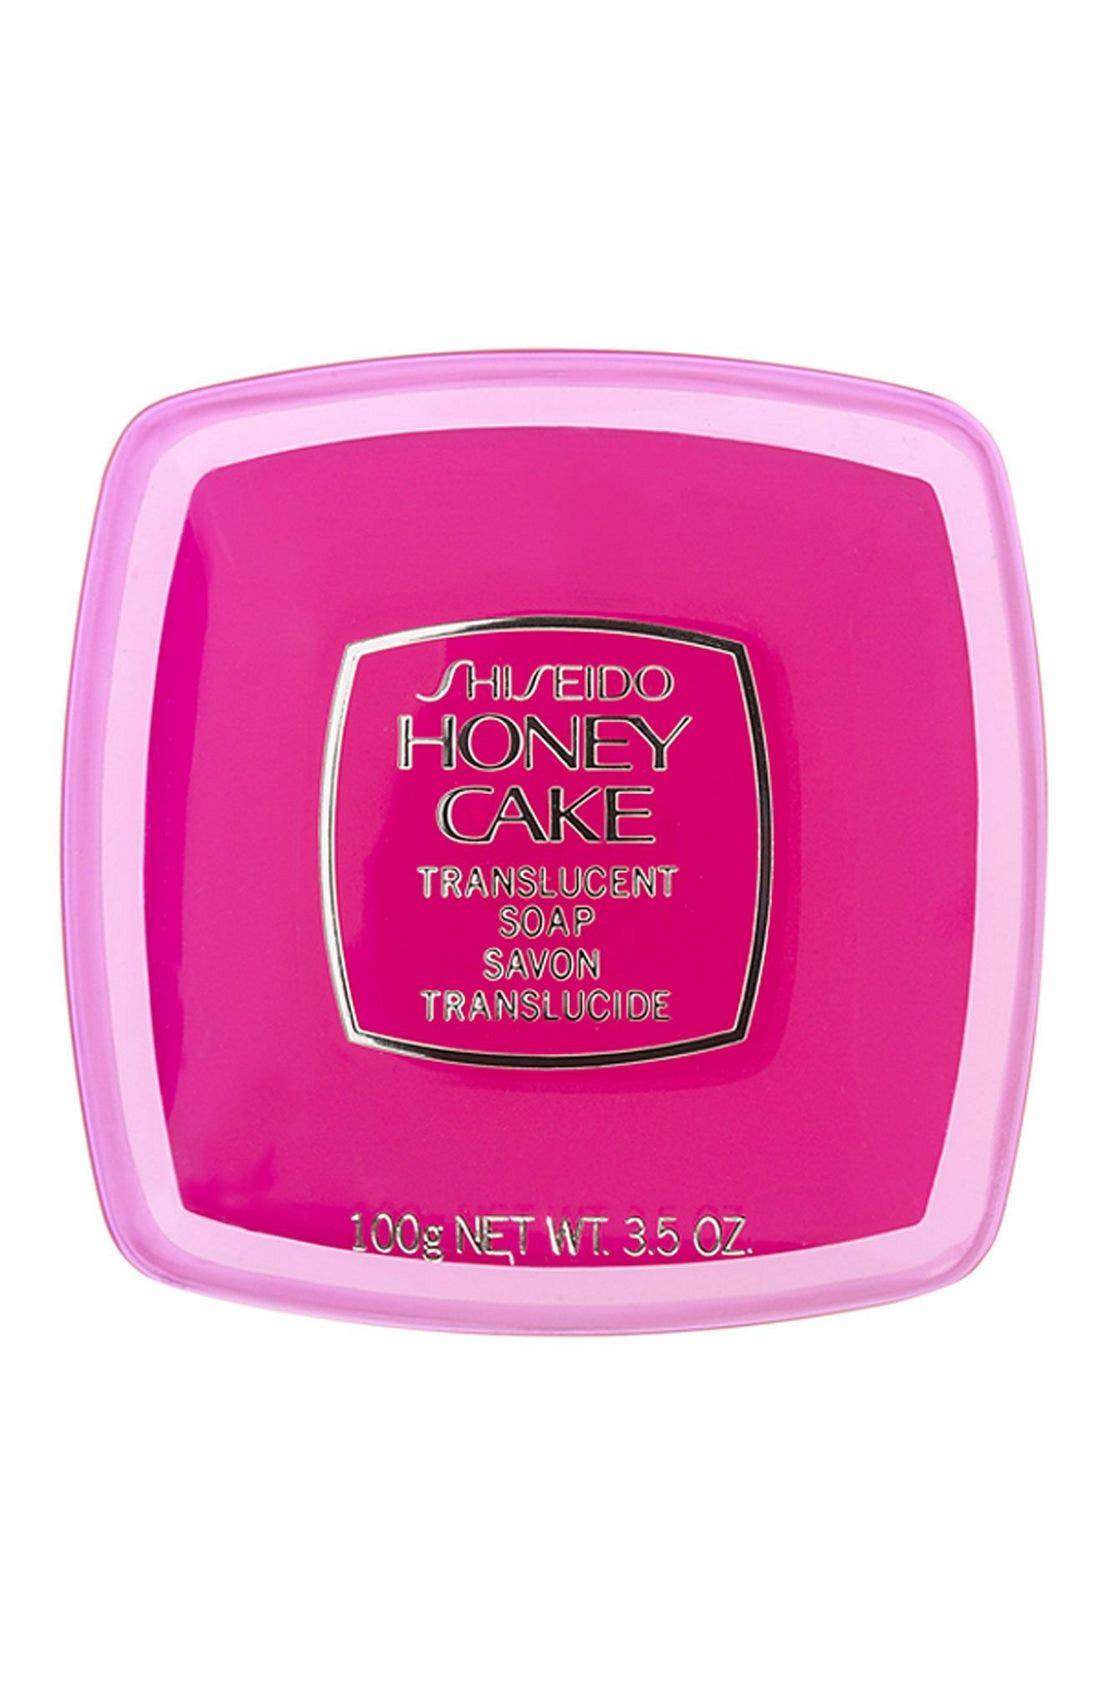 'Honey Cake' Translucent Soap,                             Alternate thumbnail 3, color,